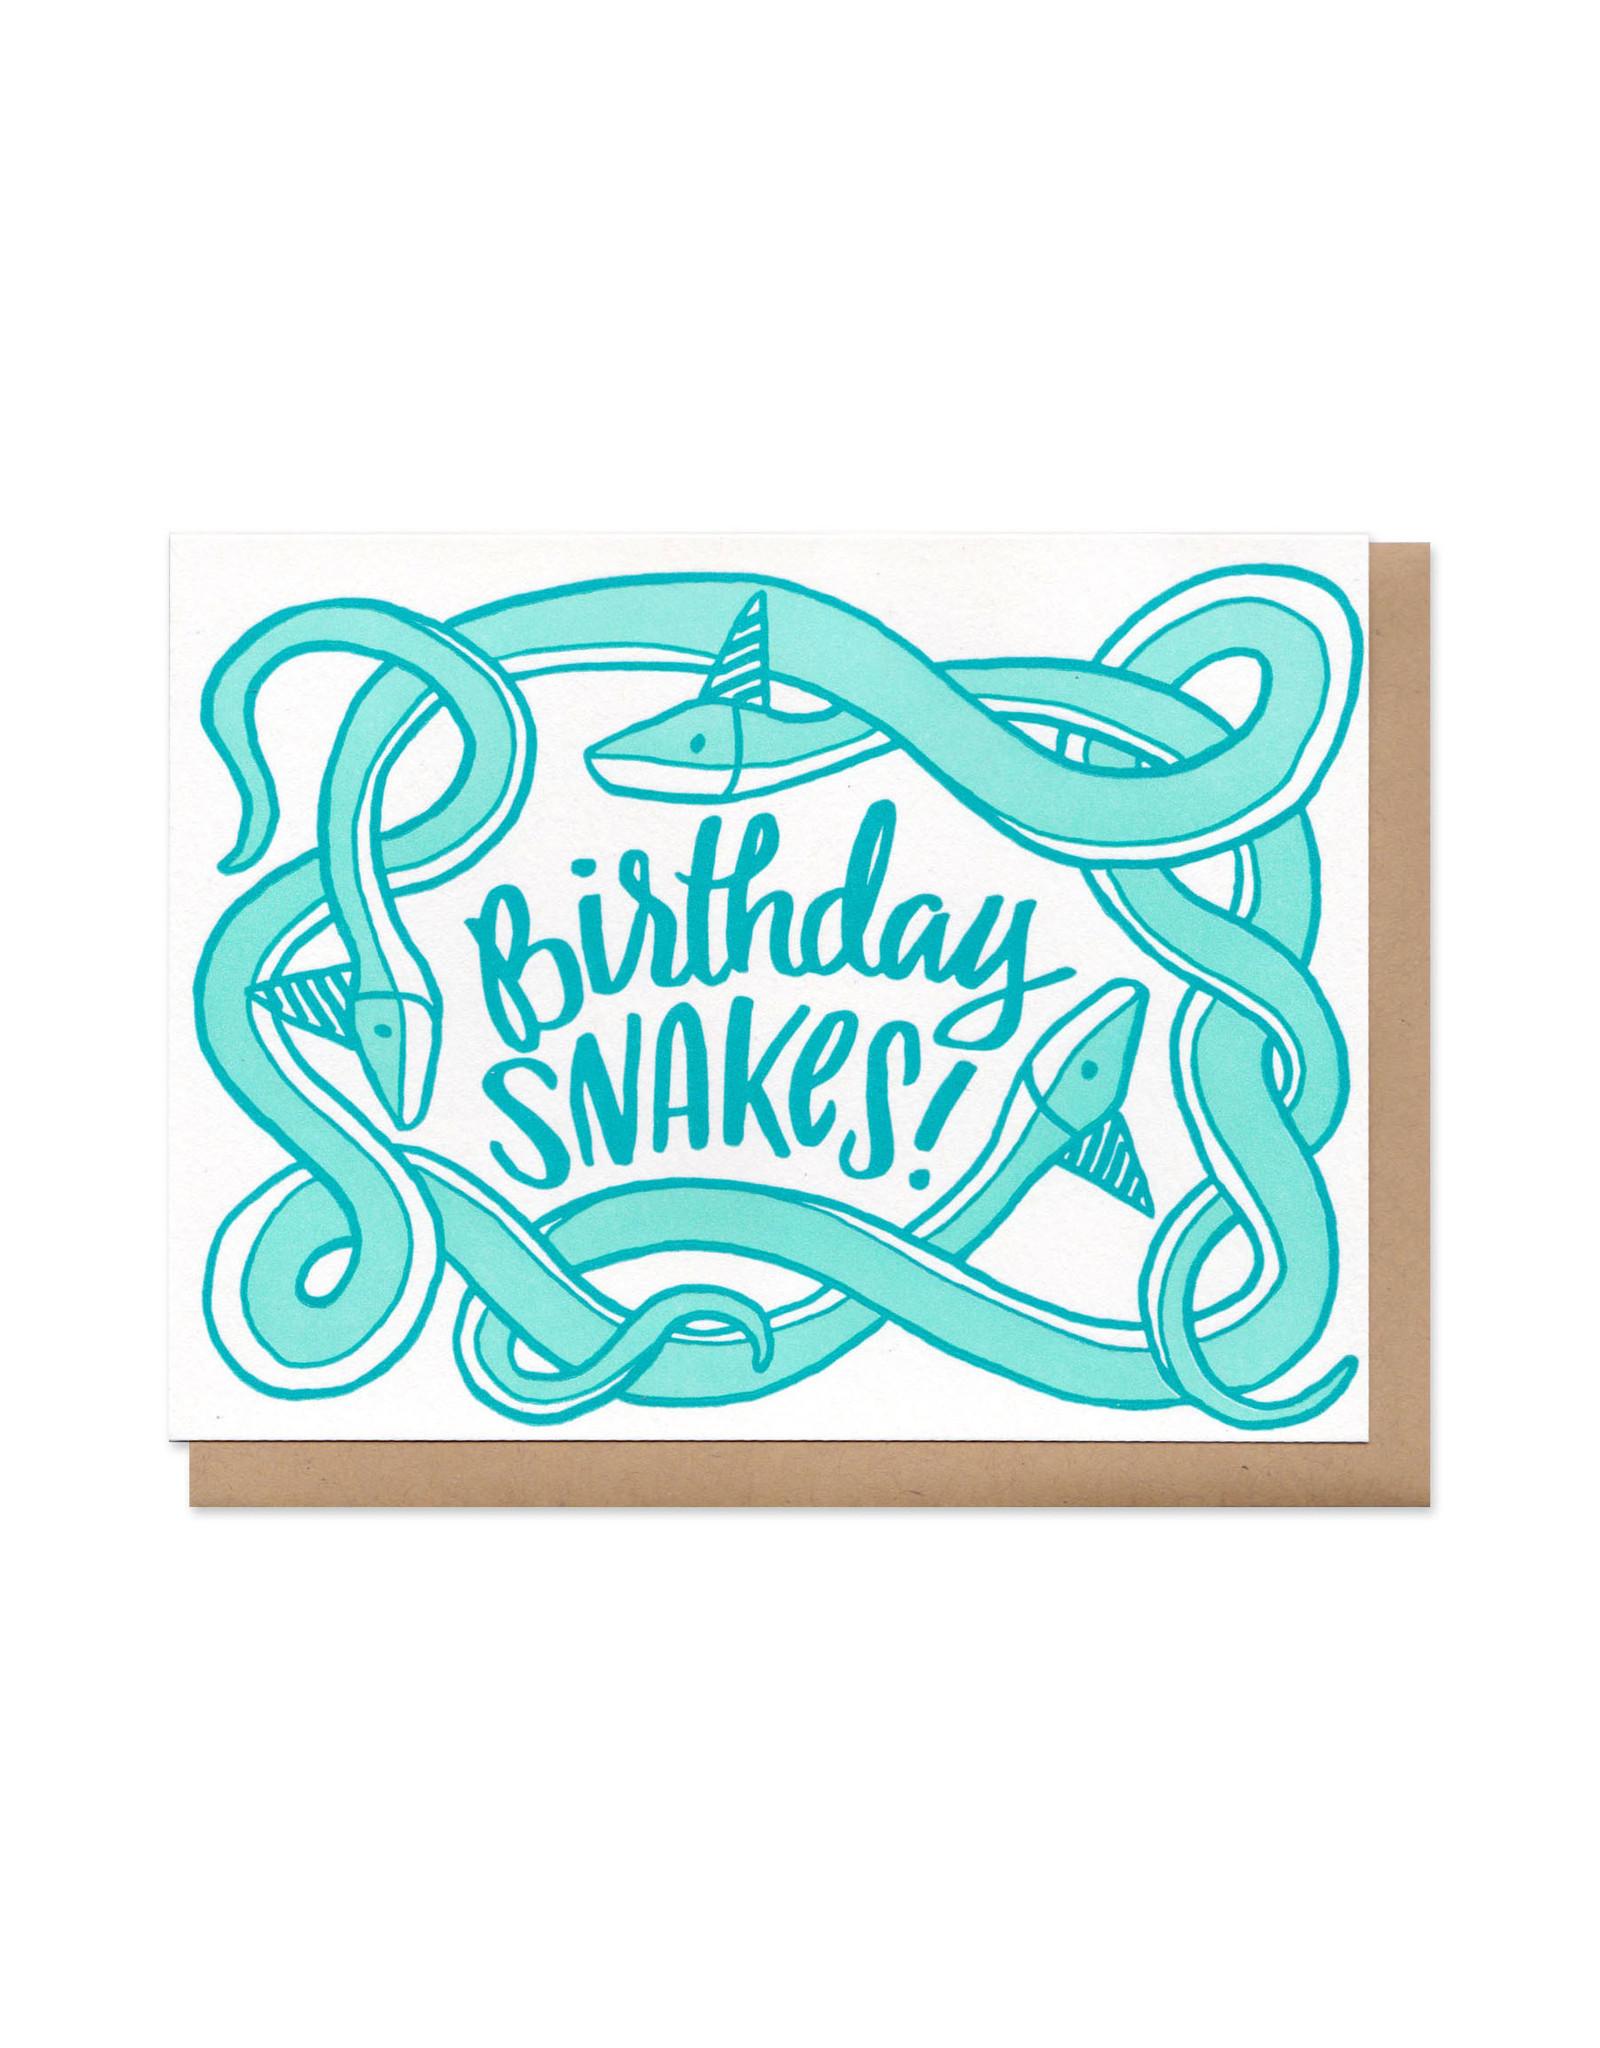 Birthday Snakes! (Blue) Greeting Card